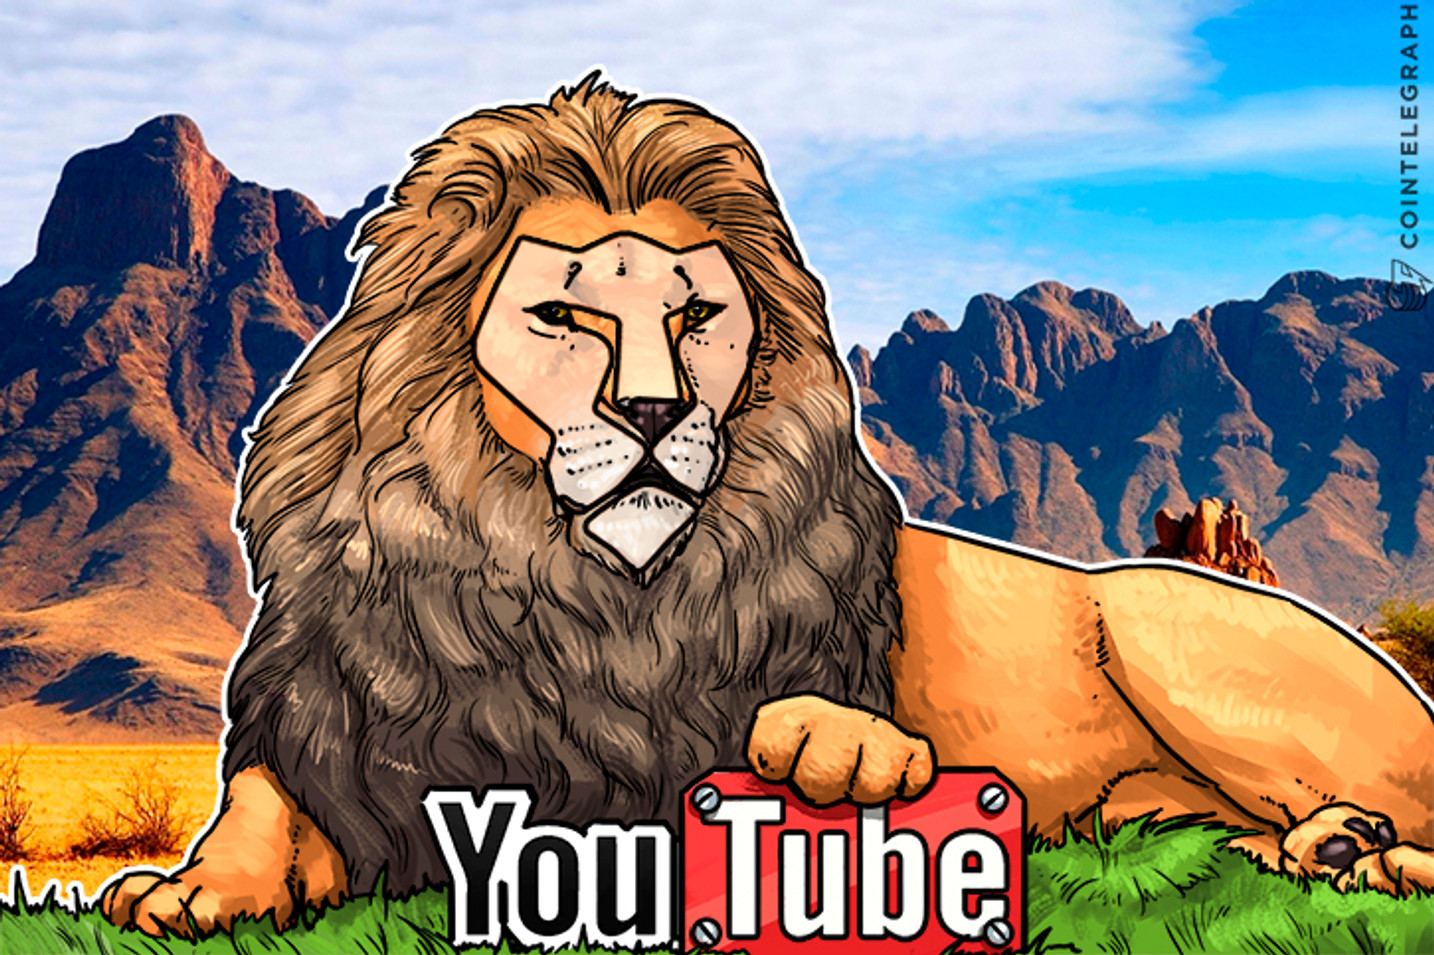 YouTube Adpocalypse Gets Blockchain Solution